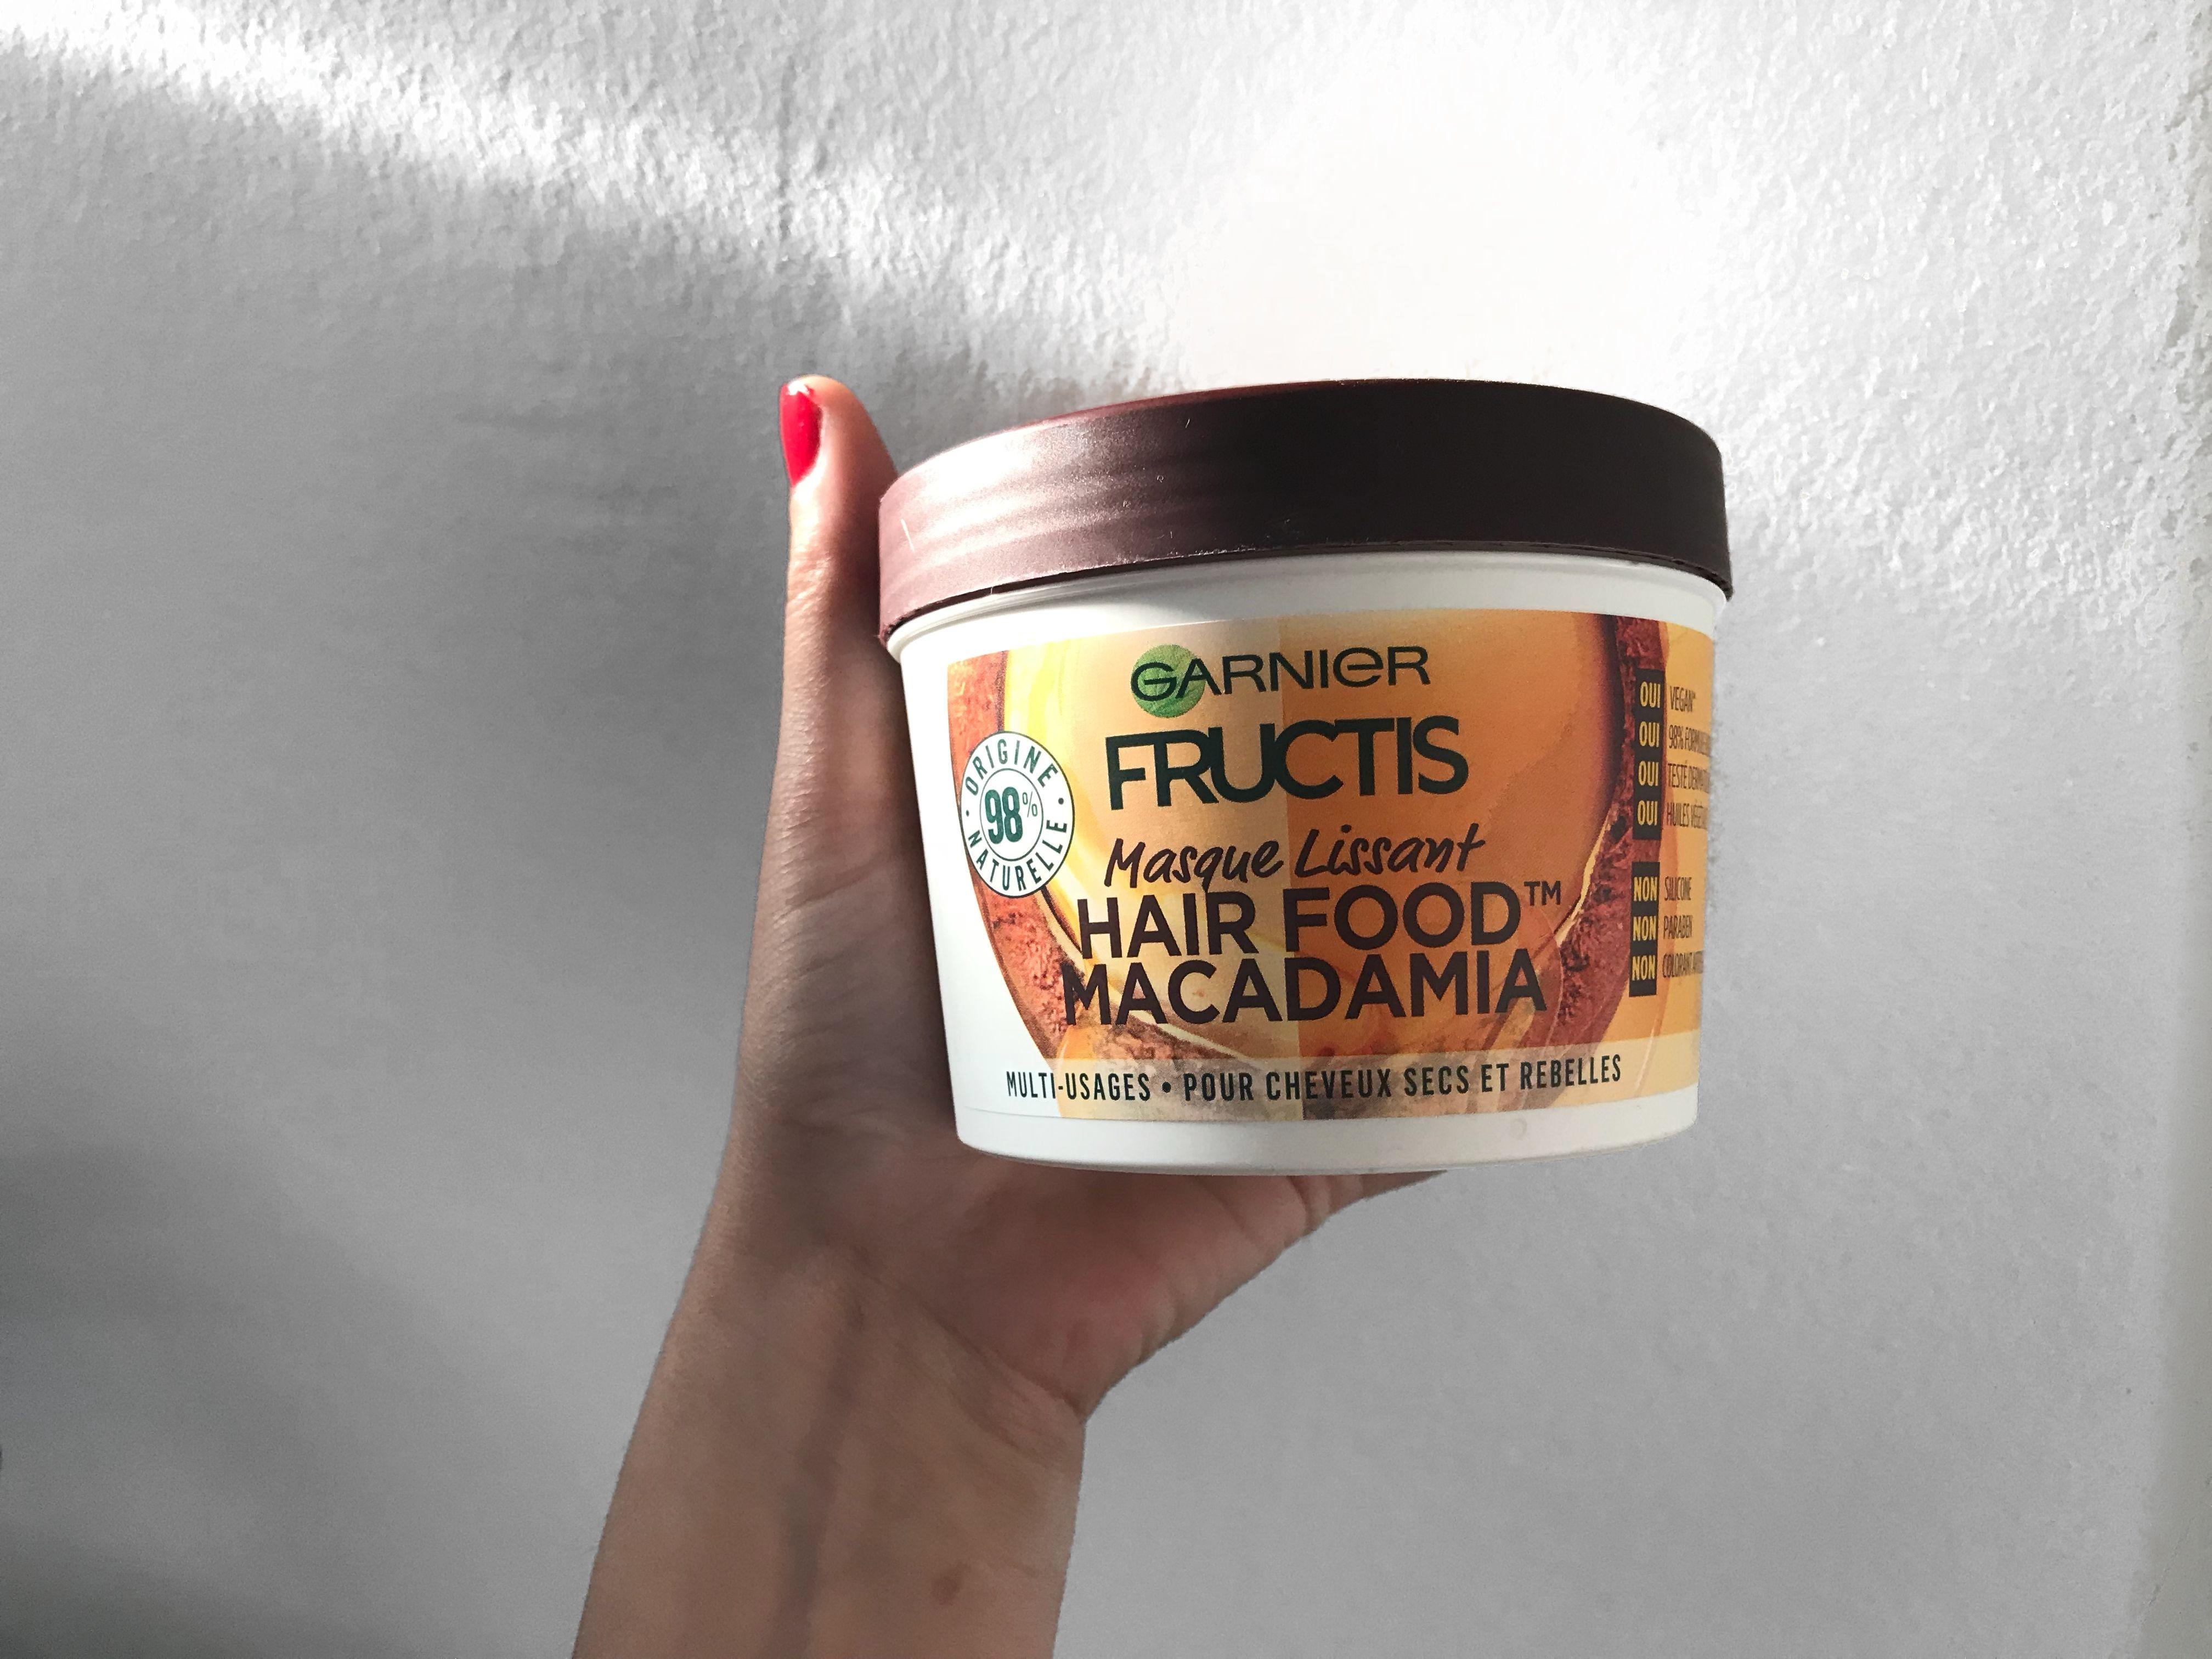 Natural Hair Food Macadamia Masque Cheveux Coiffure Cheveux Naturels Cheveux Naturels